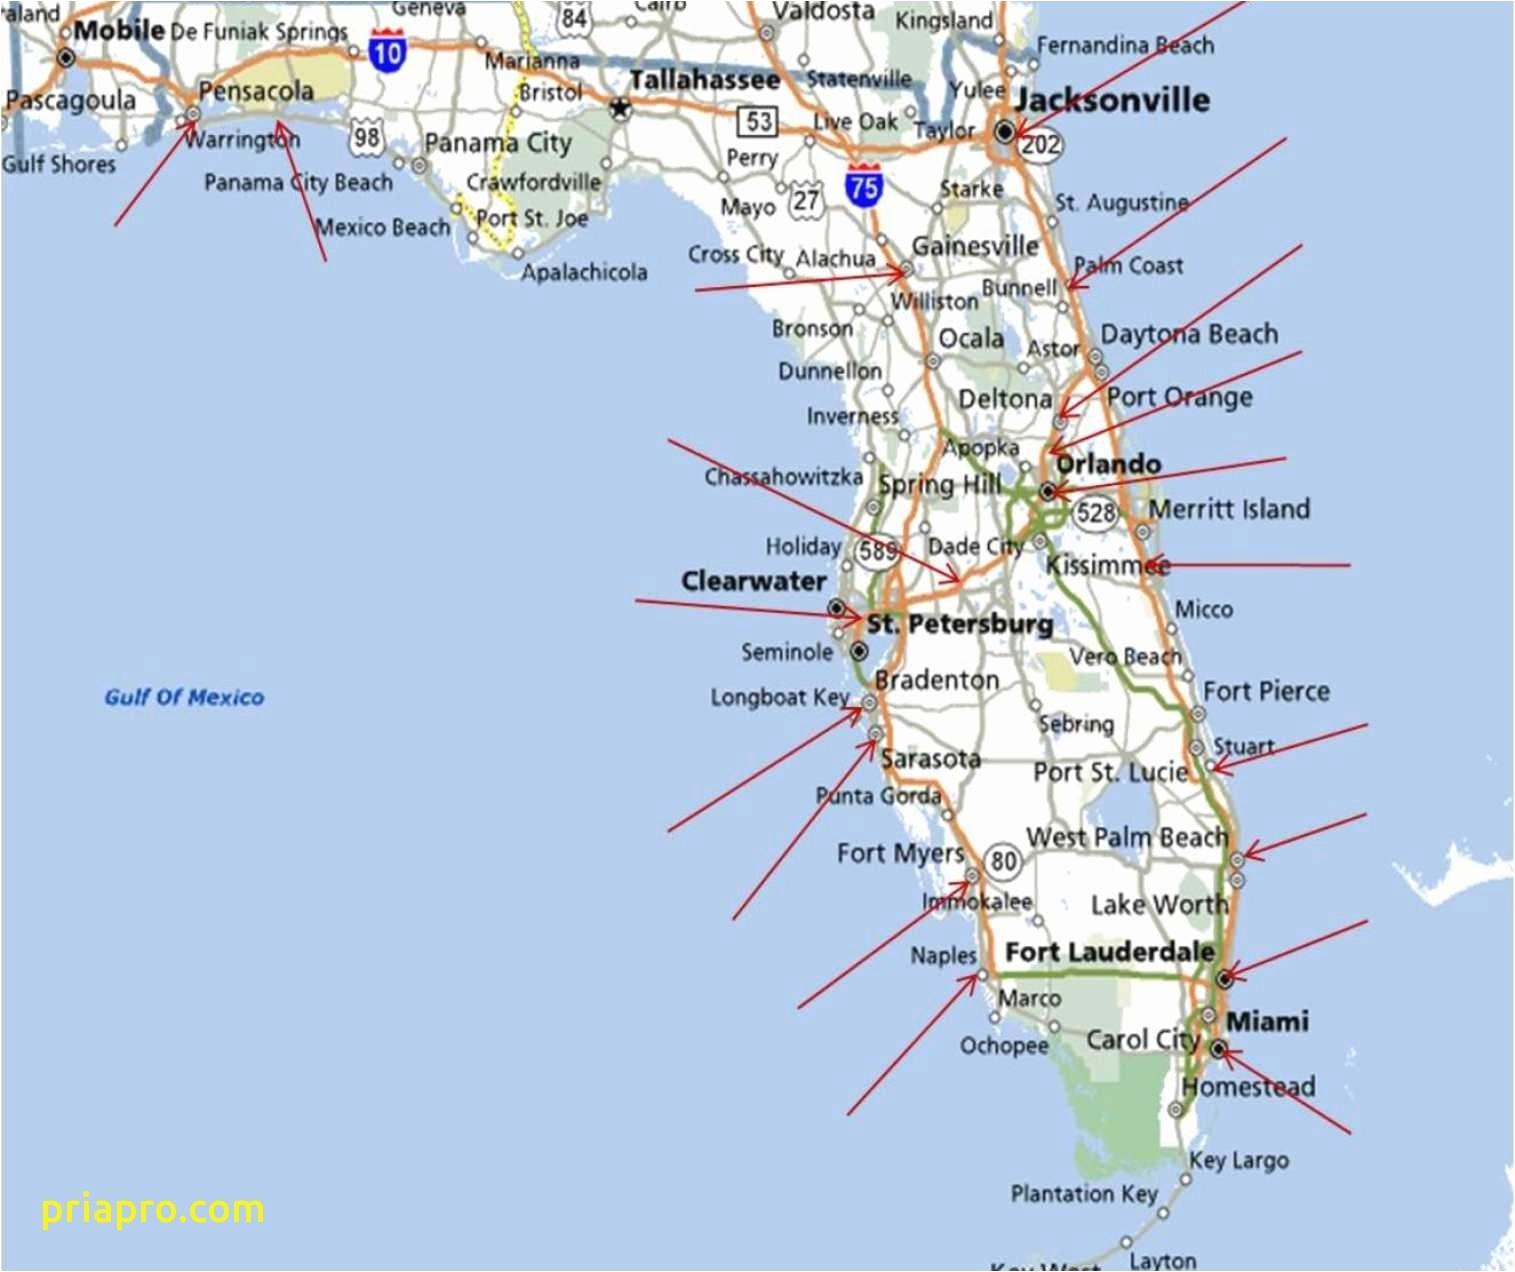 East Coast Beaches Map Inspirational Florida Beach Map Florida River - Florida East Coast Beaches Map